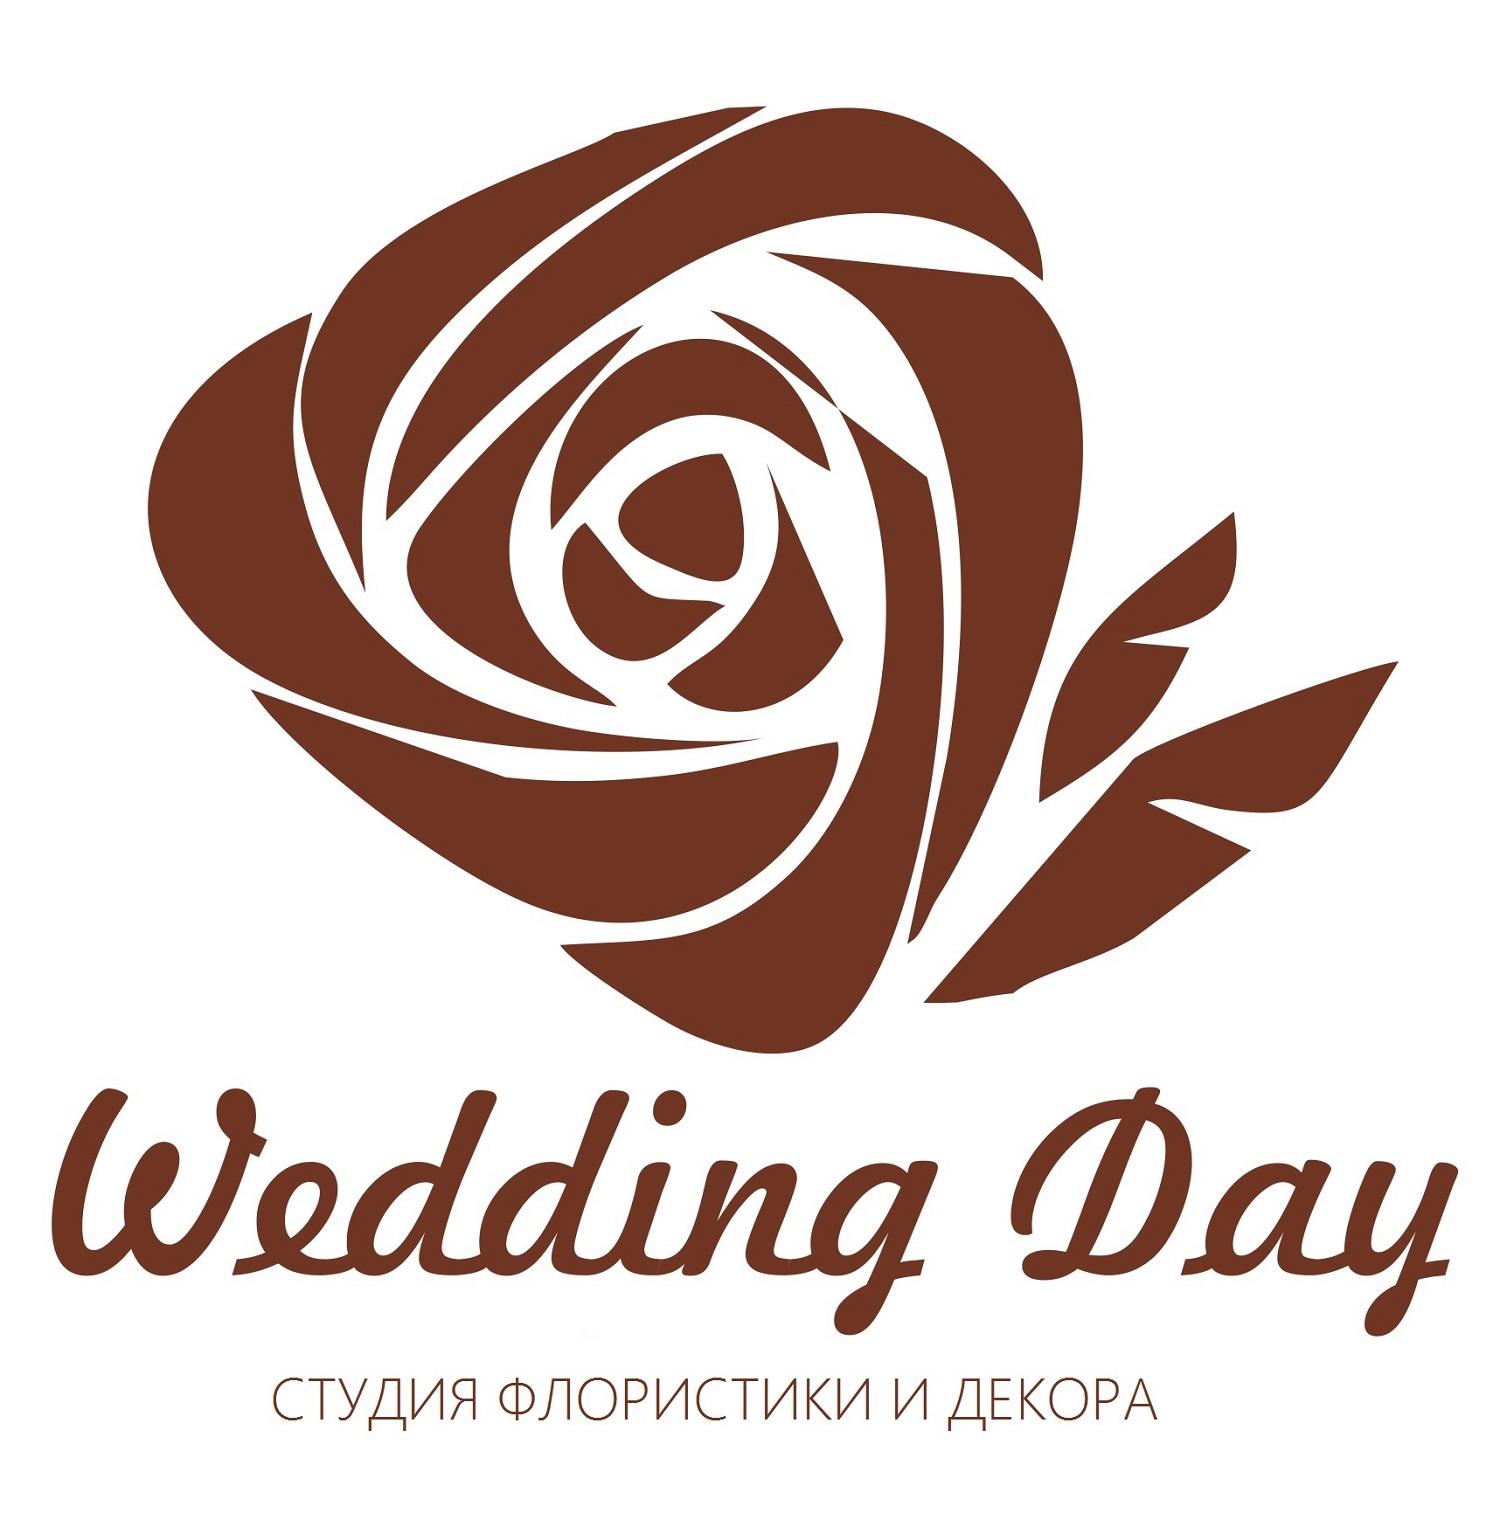 Все для свадьбы краснодарский край